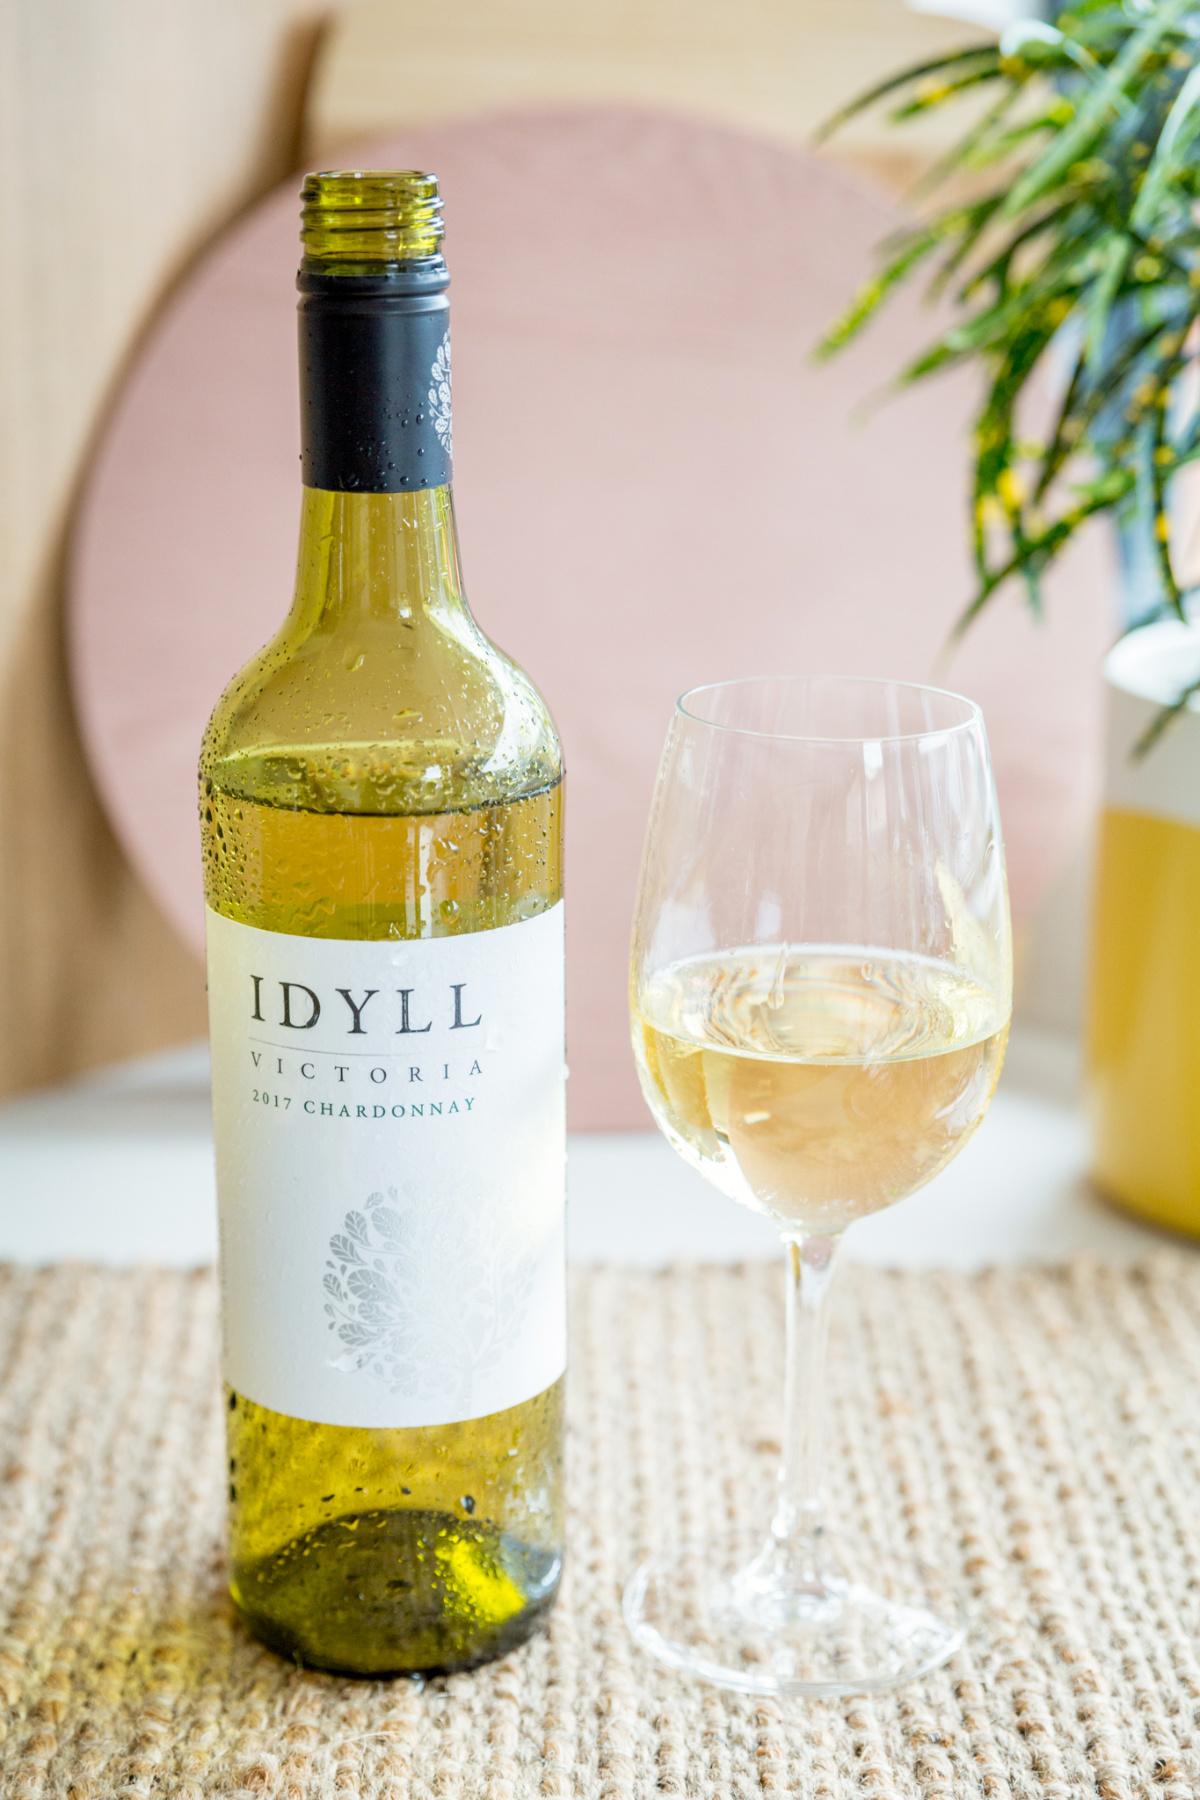 Idyll Wine Co Chardonnay